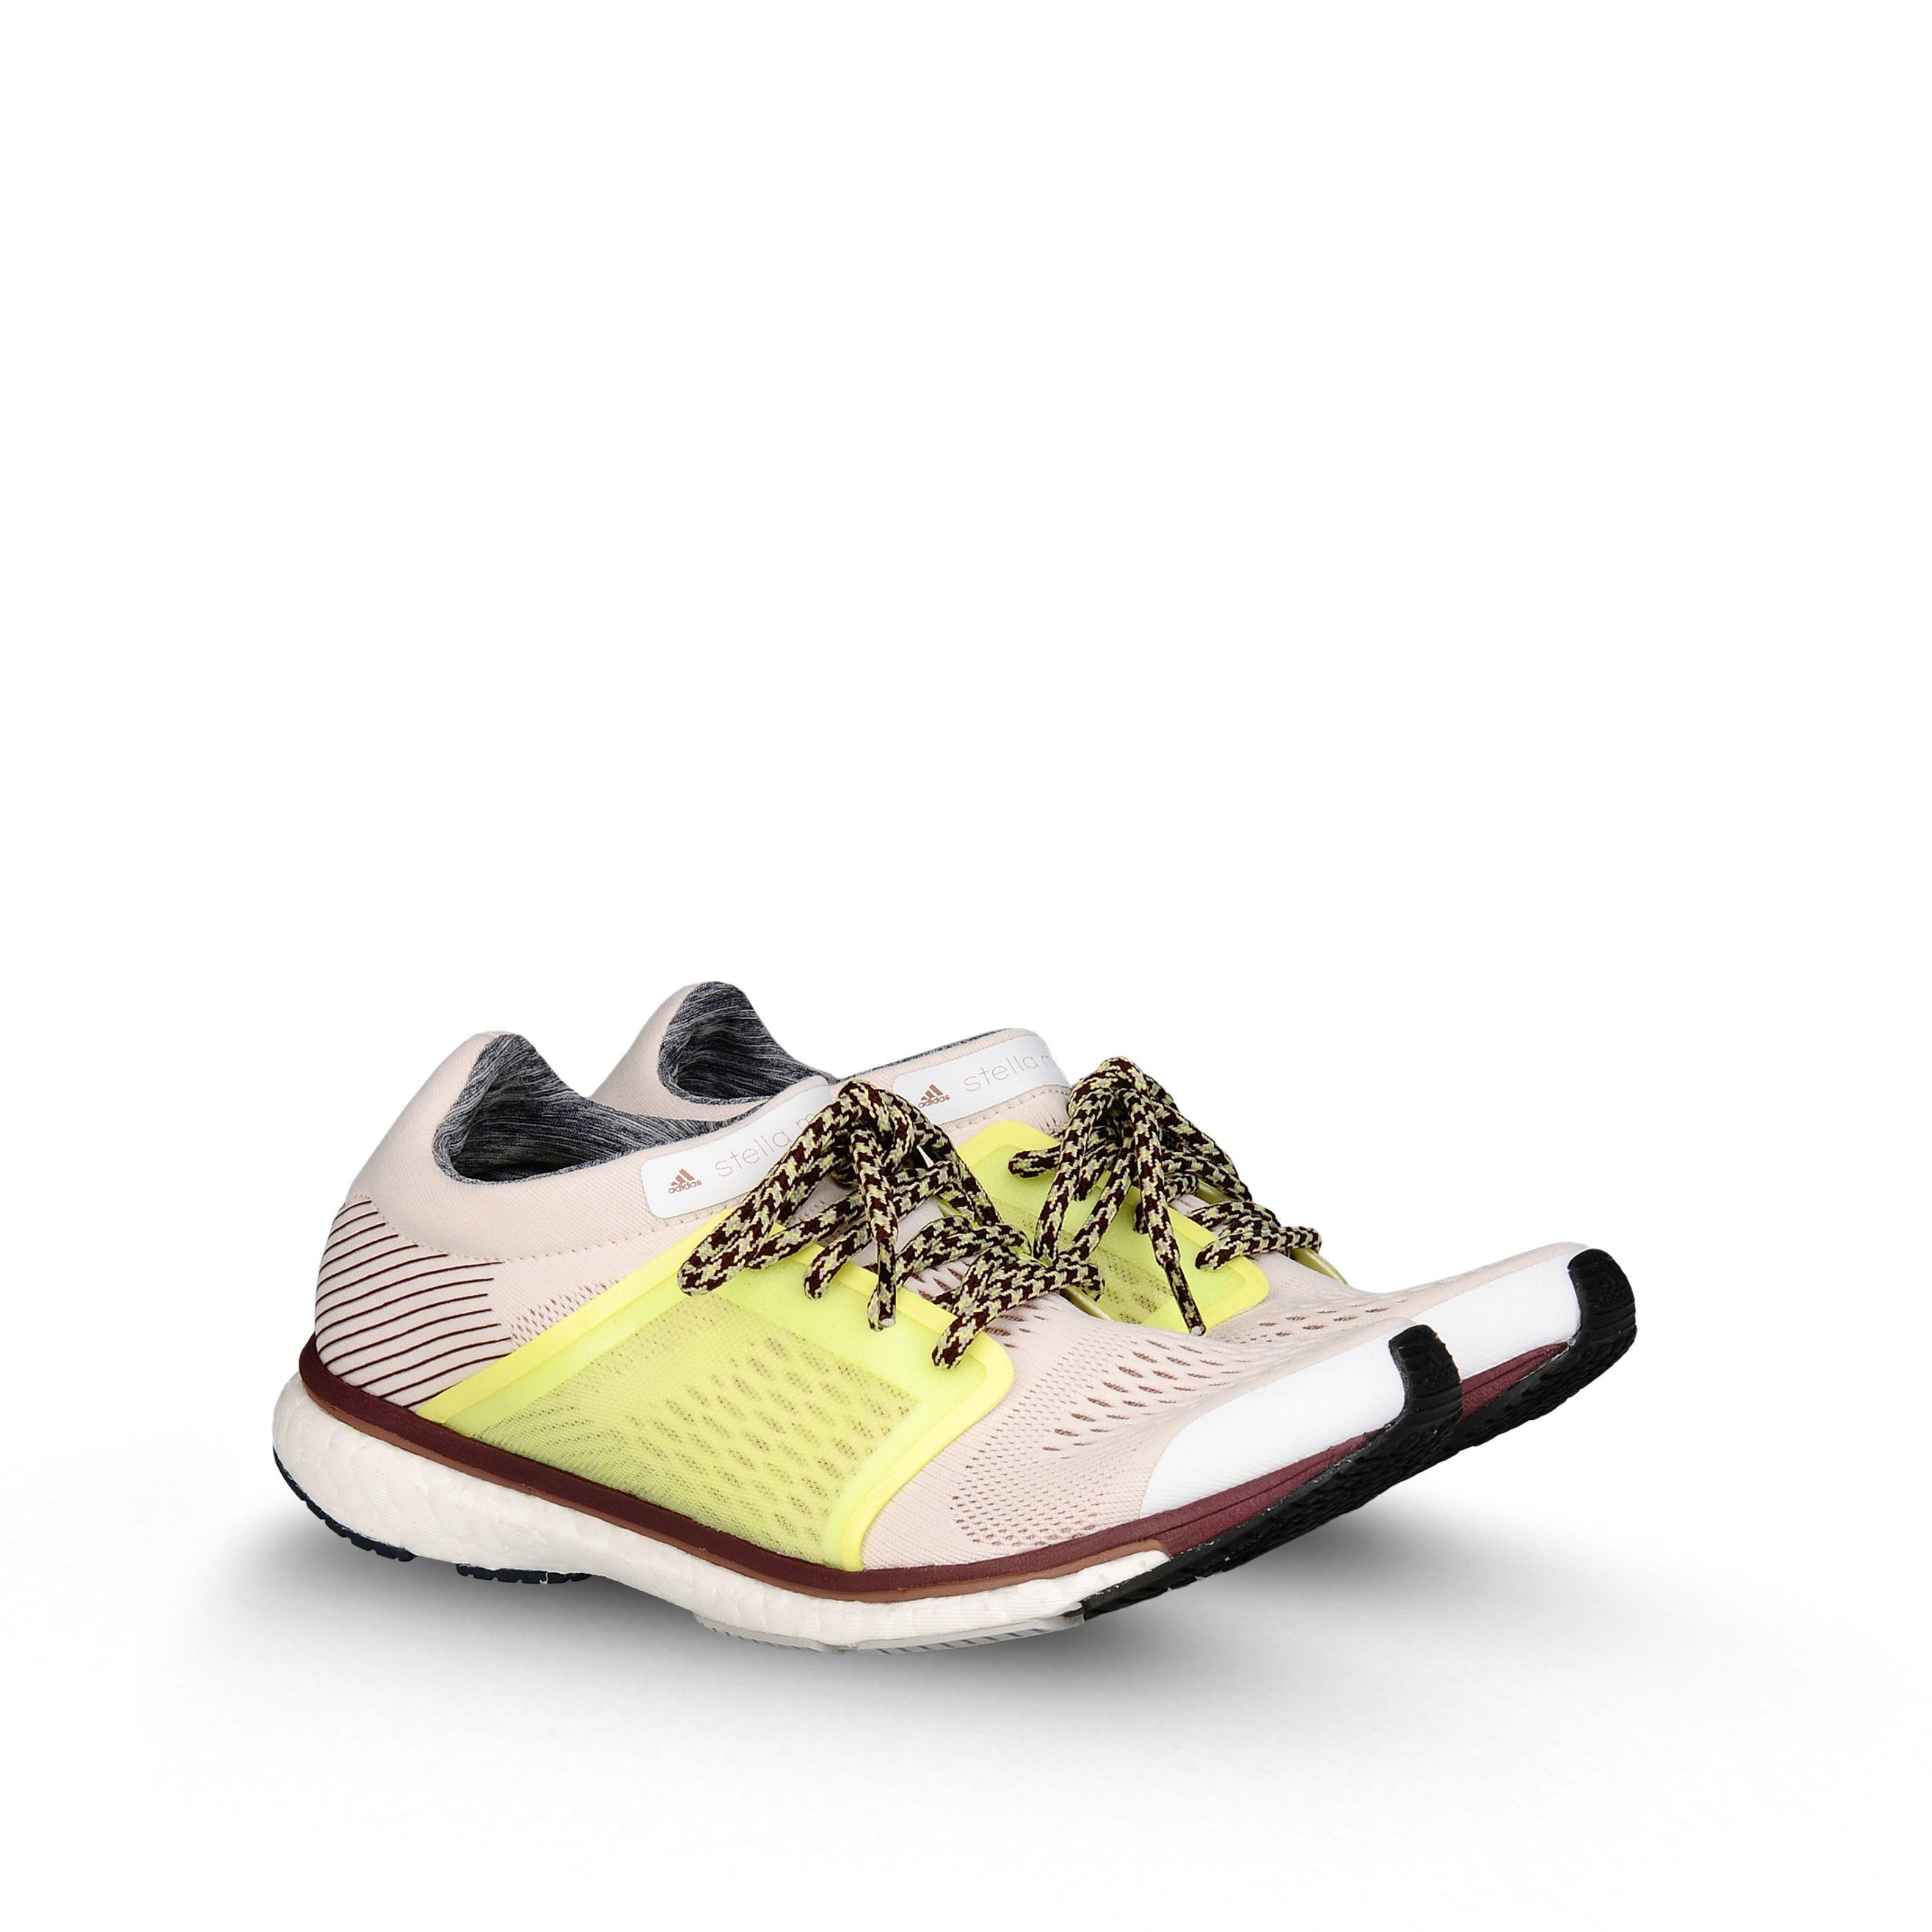 Women\u0027s ADIDAS BY STELLA MCCARTNEY Adidas footwear - Footwear - Shop on the  Official Online Store